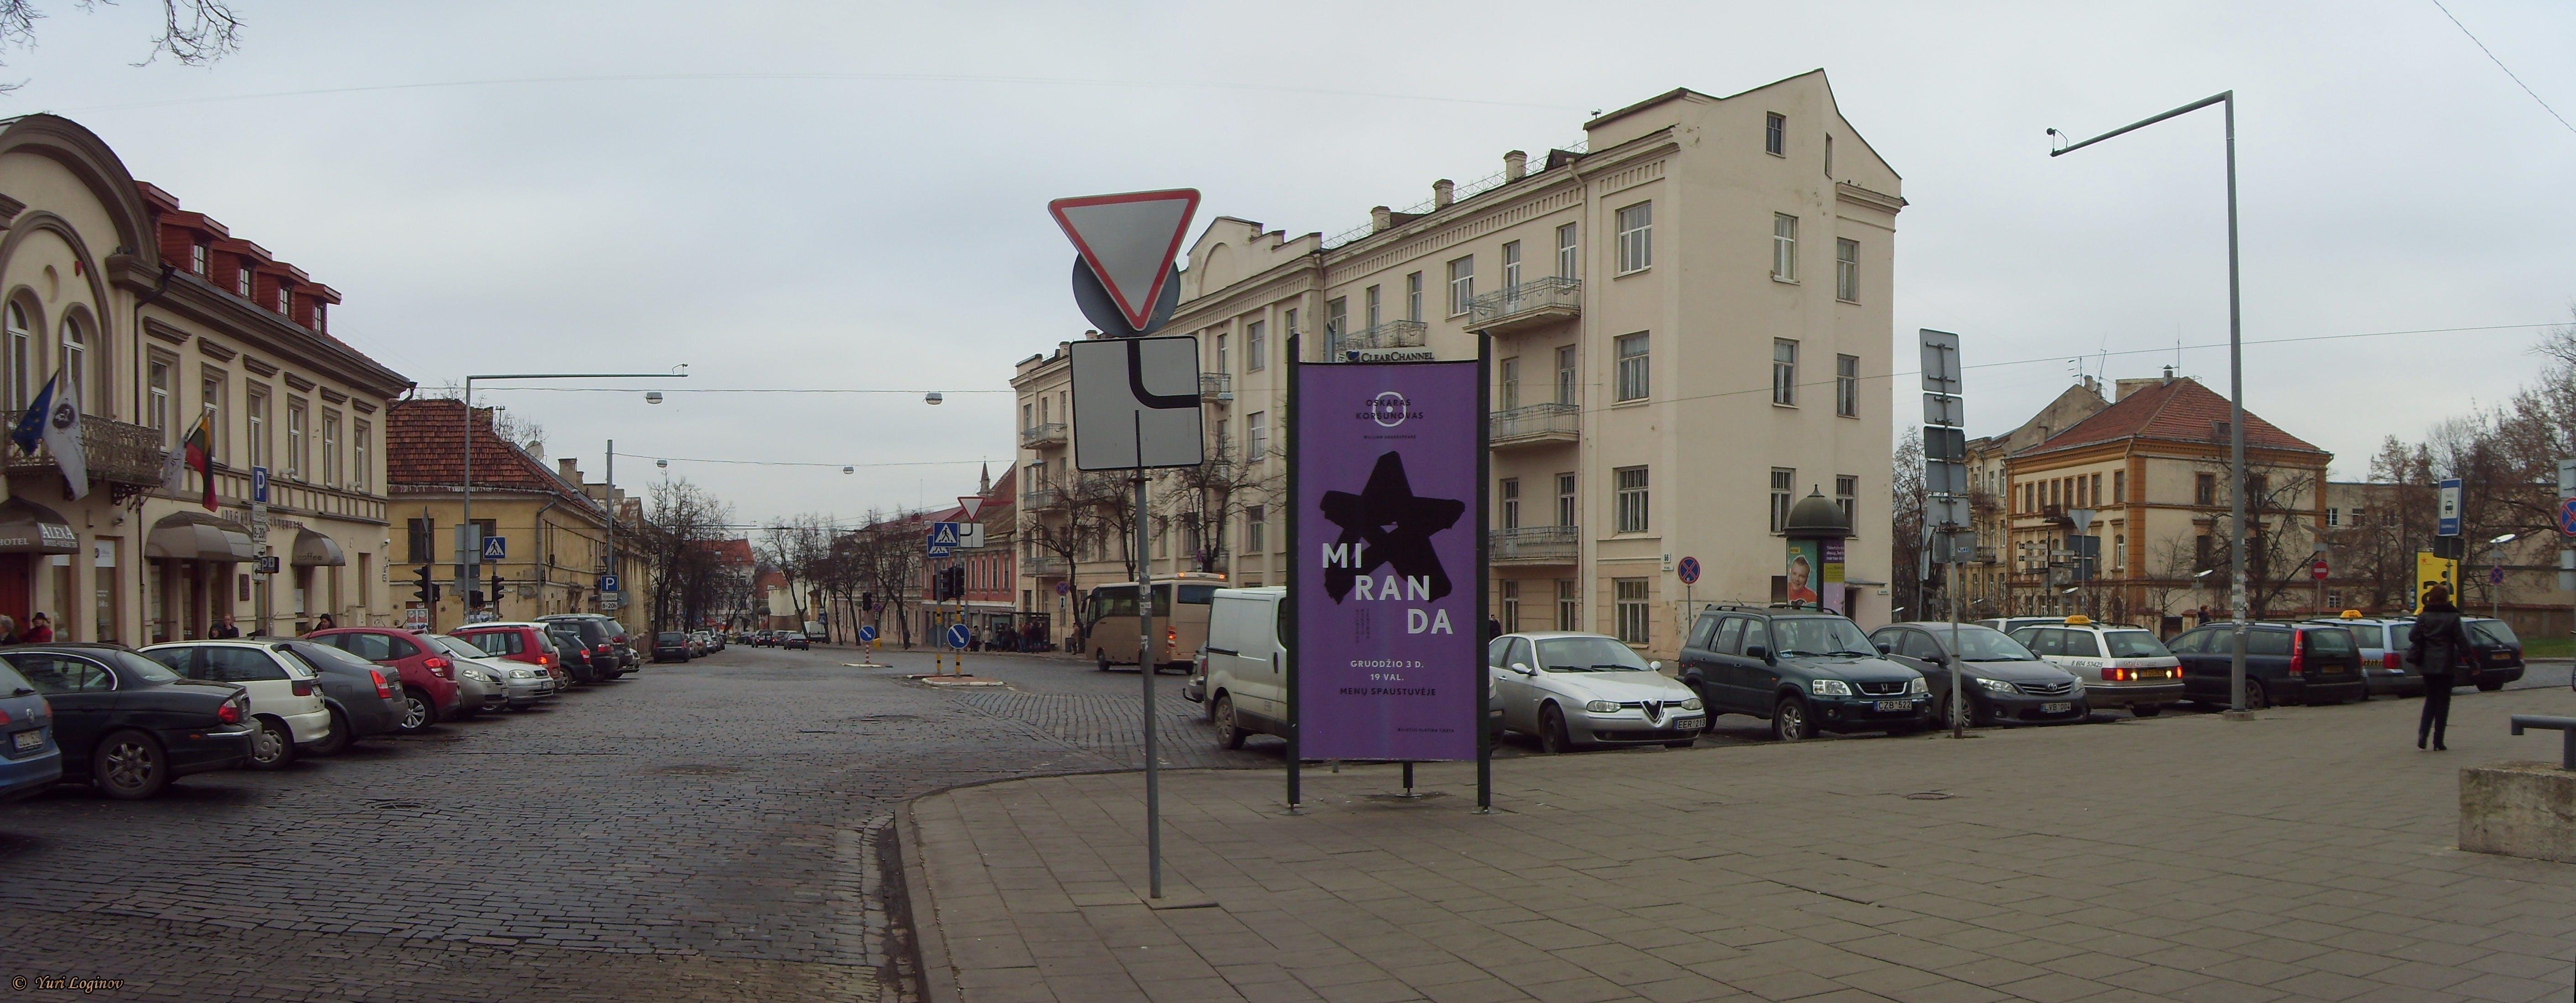 Lietuva, lithuania, Vilniaus senamiestis